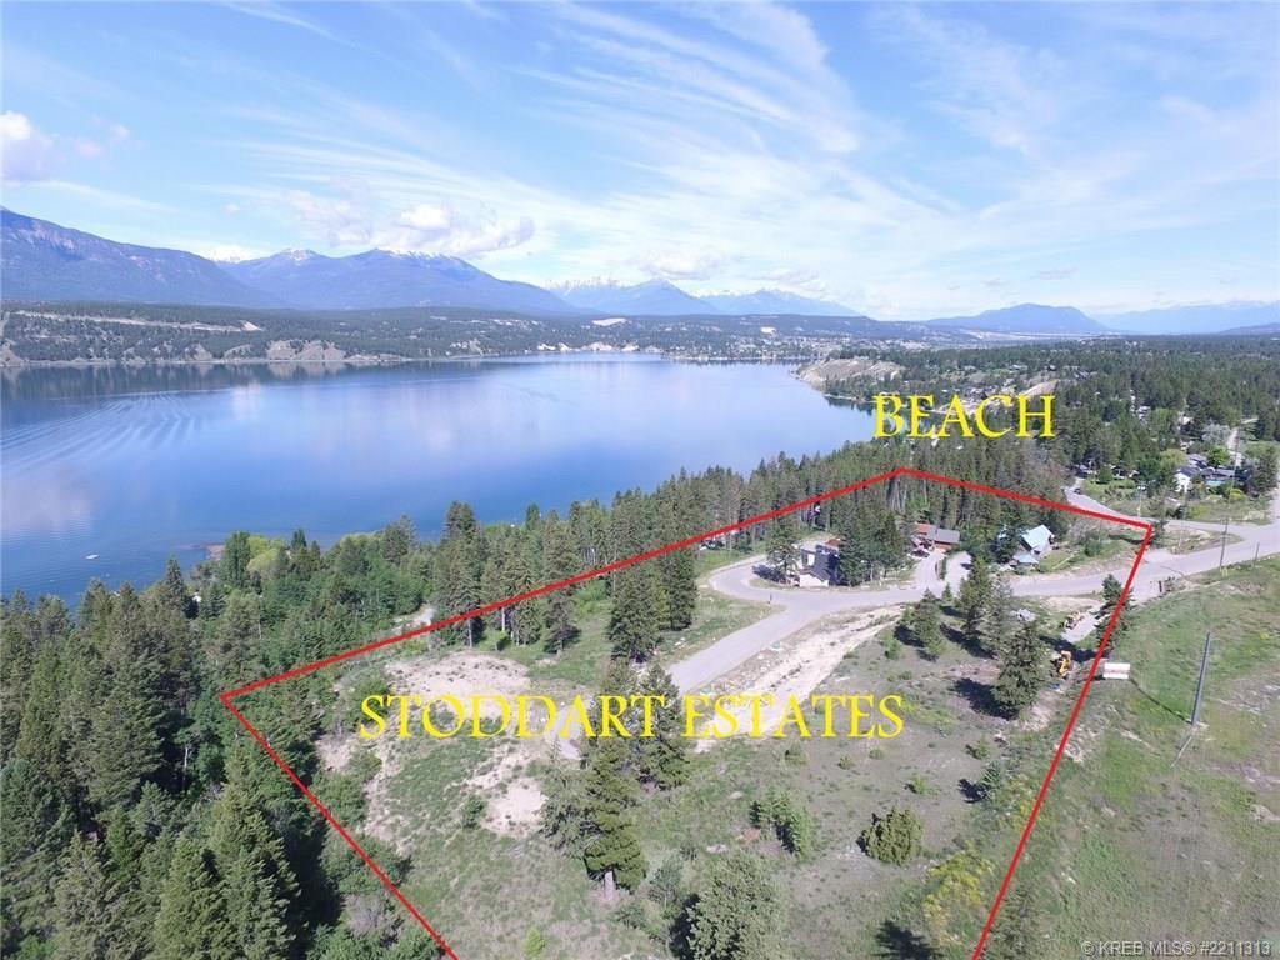 Lot 6 Stoddart Estates Drive, Windermere, British Columbia  V0B 2L0 - Photo 1 - 2451191